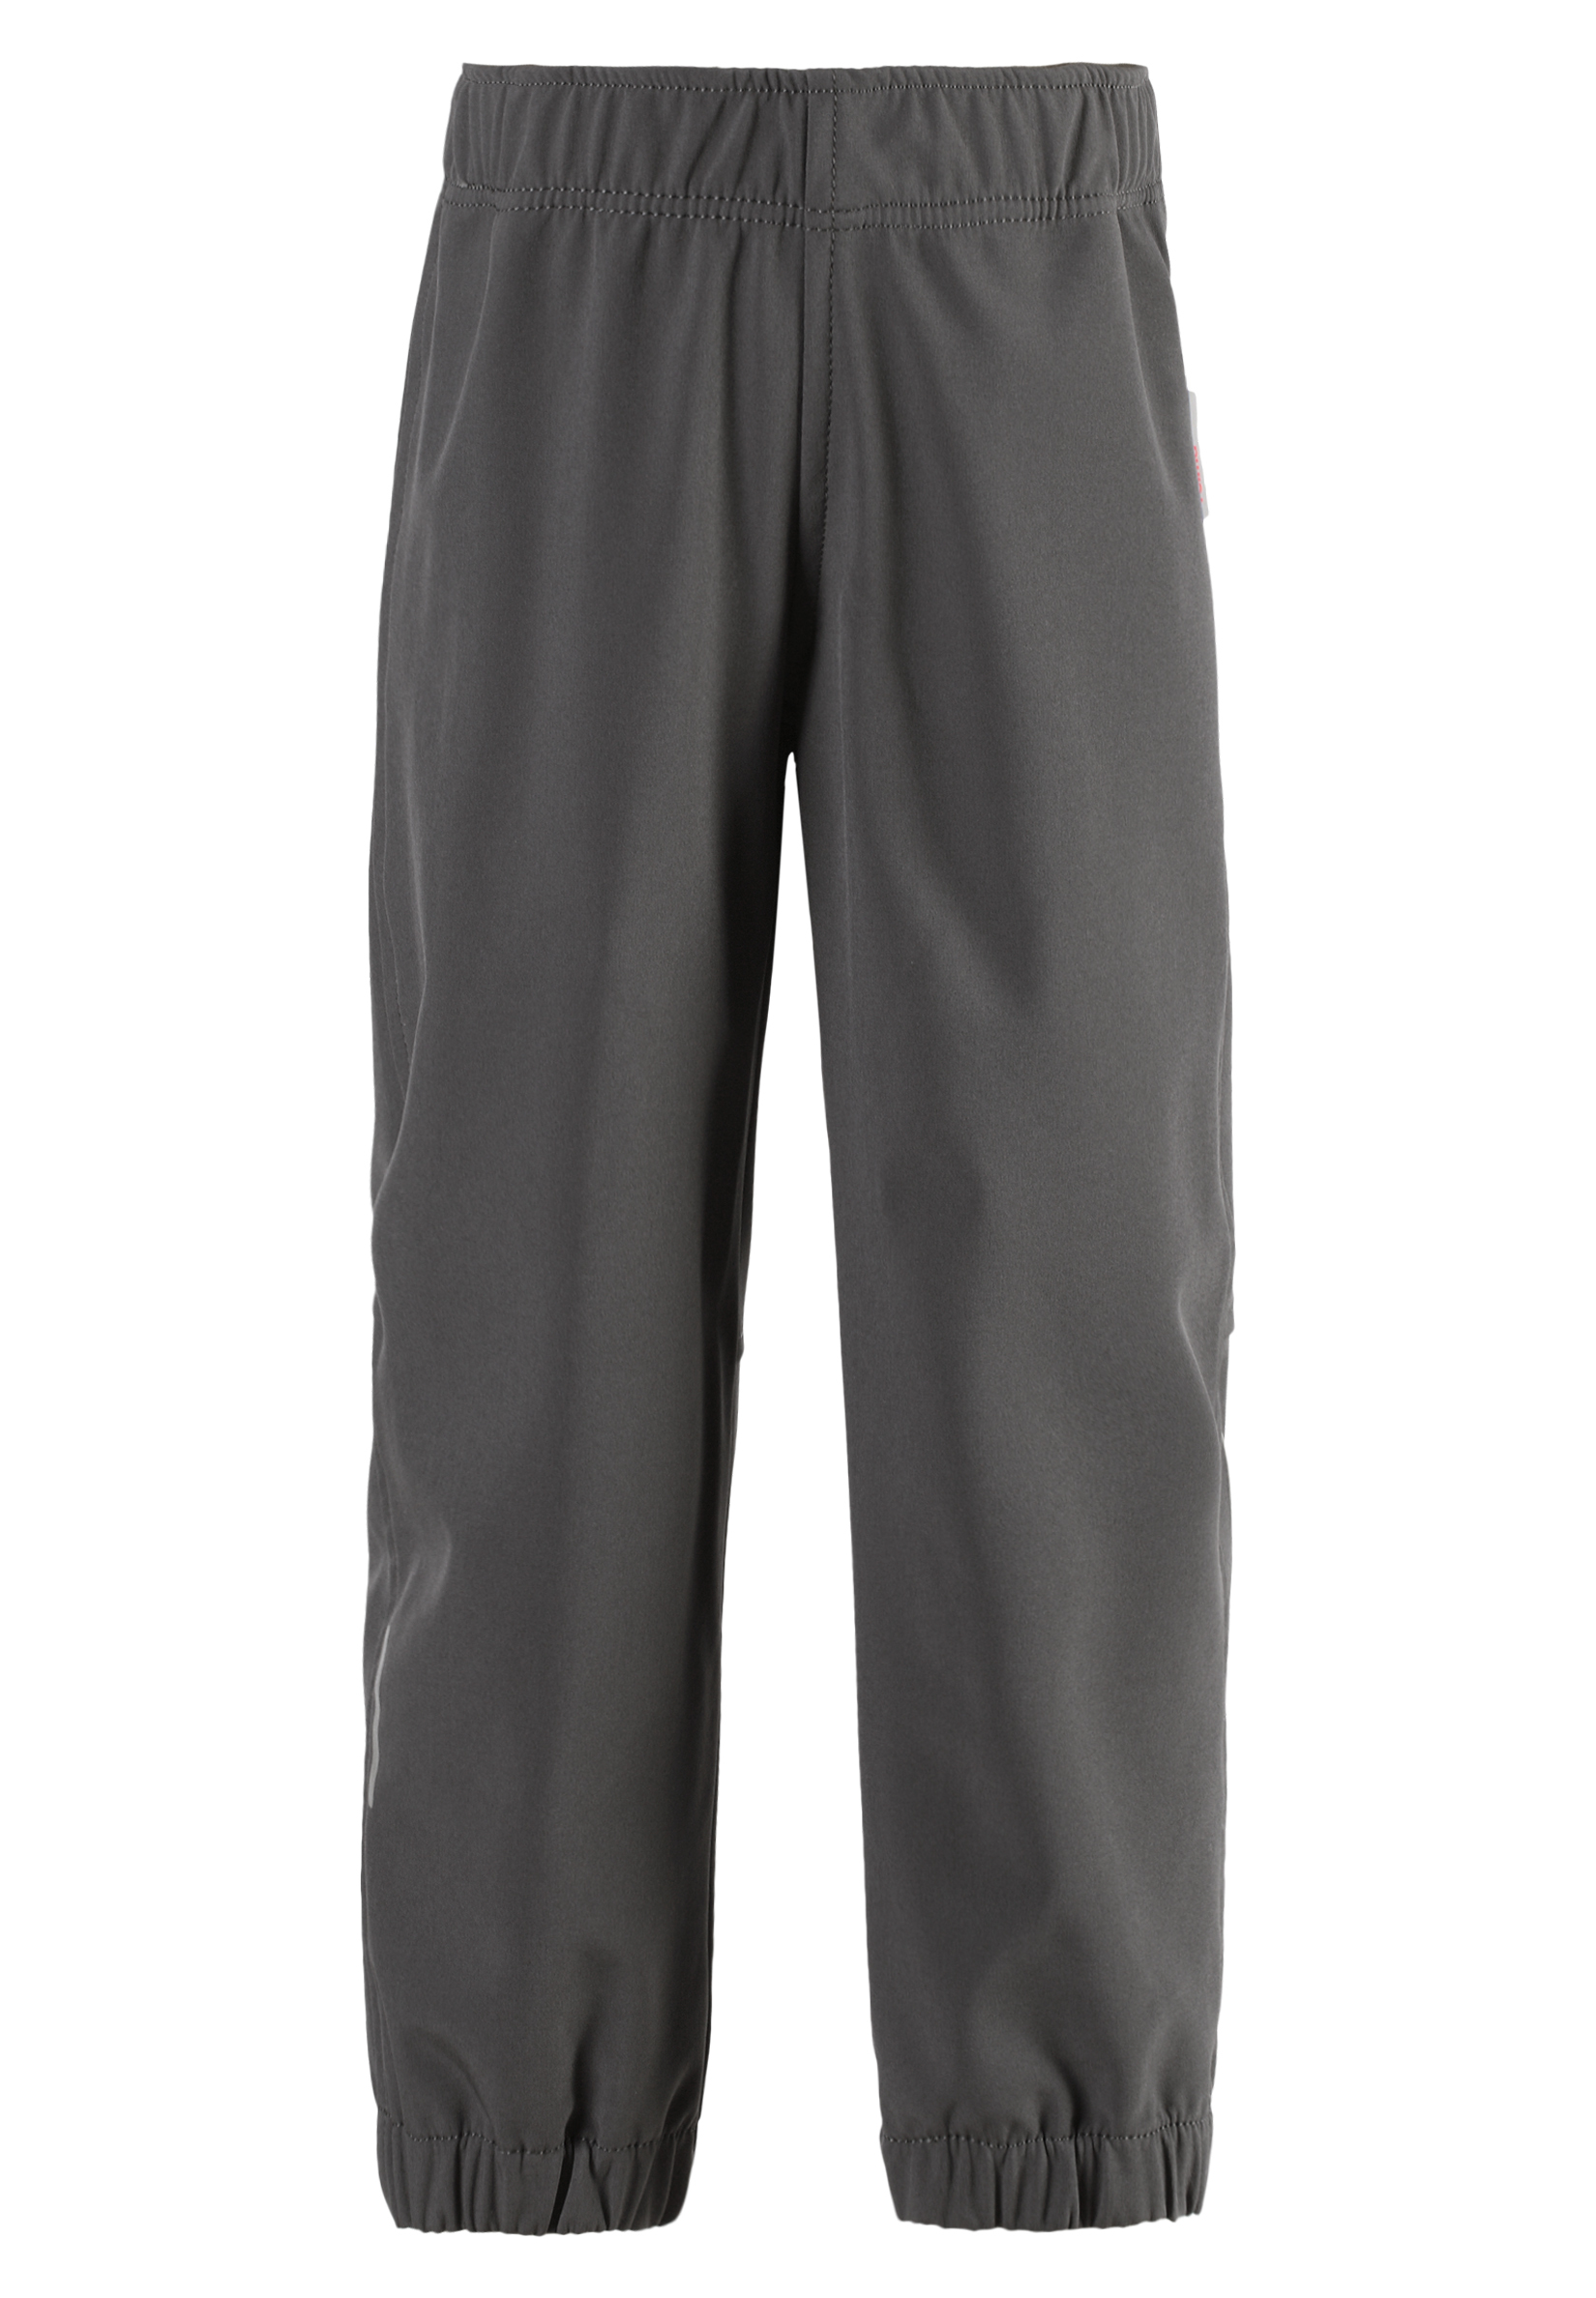 Detské prechodné nohavice REIMA